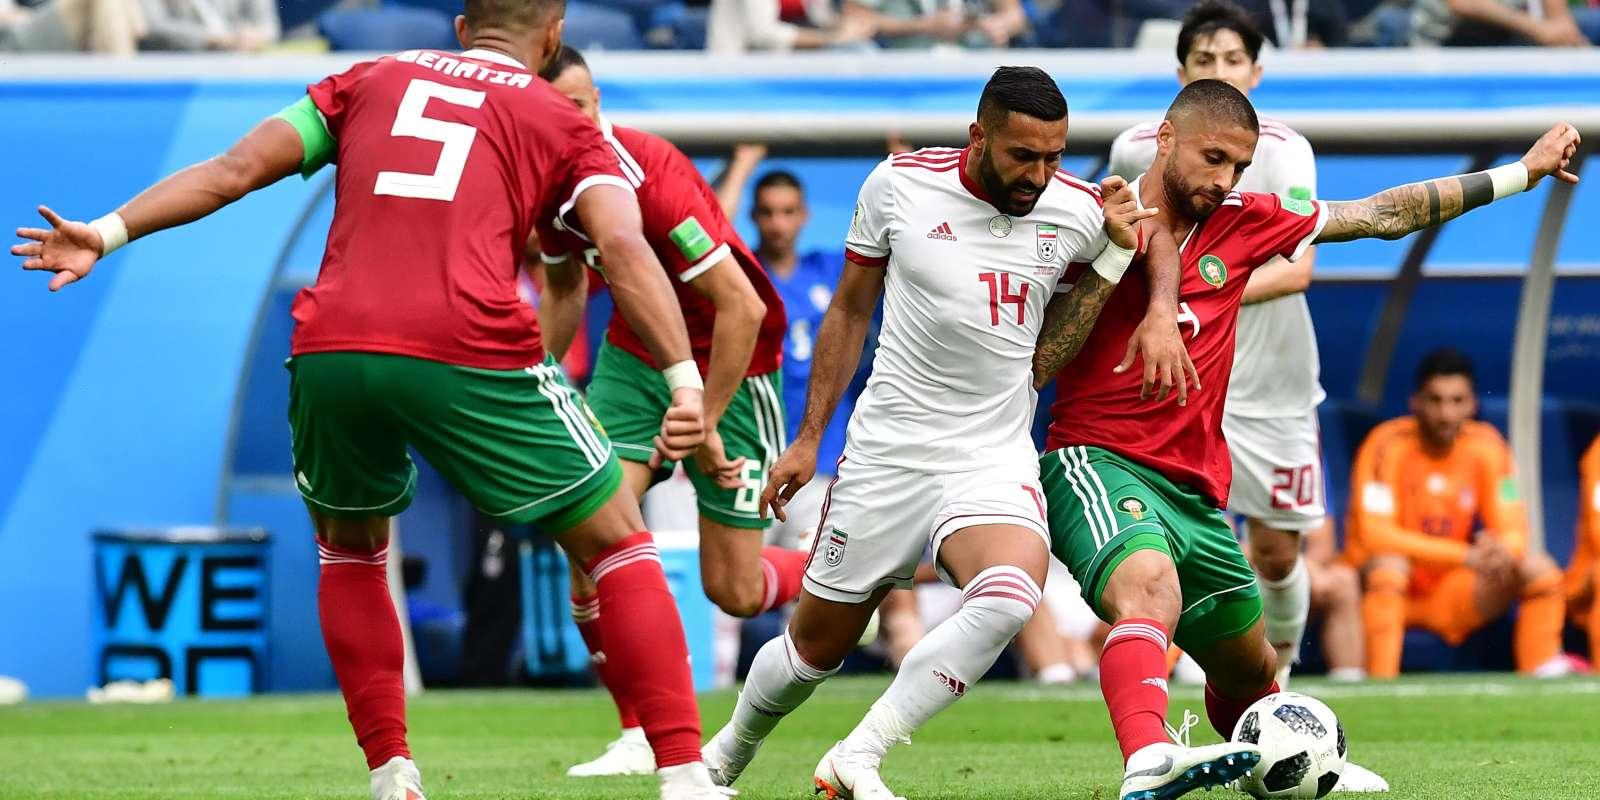 L'Iran a pris le dessus sur le Maroc.